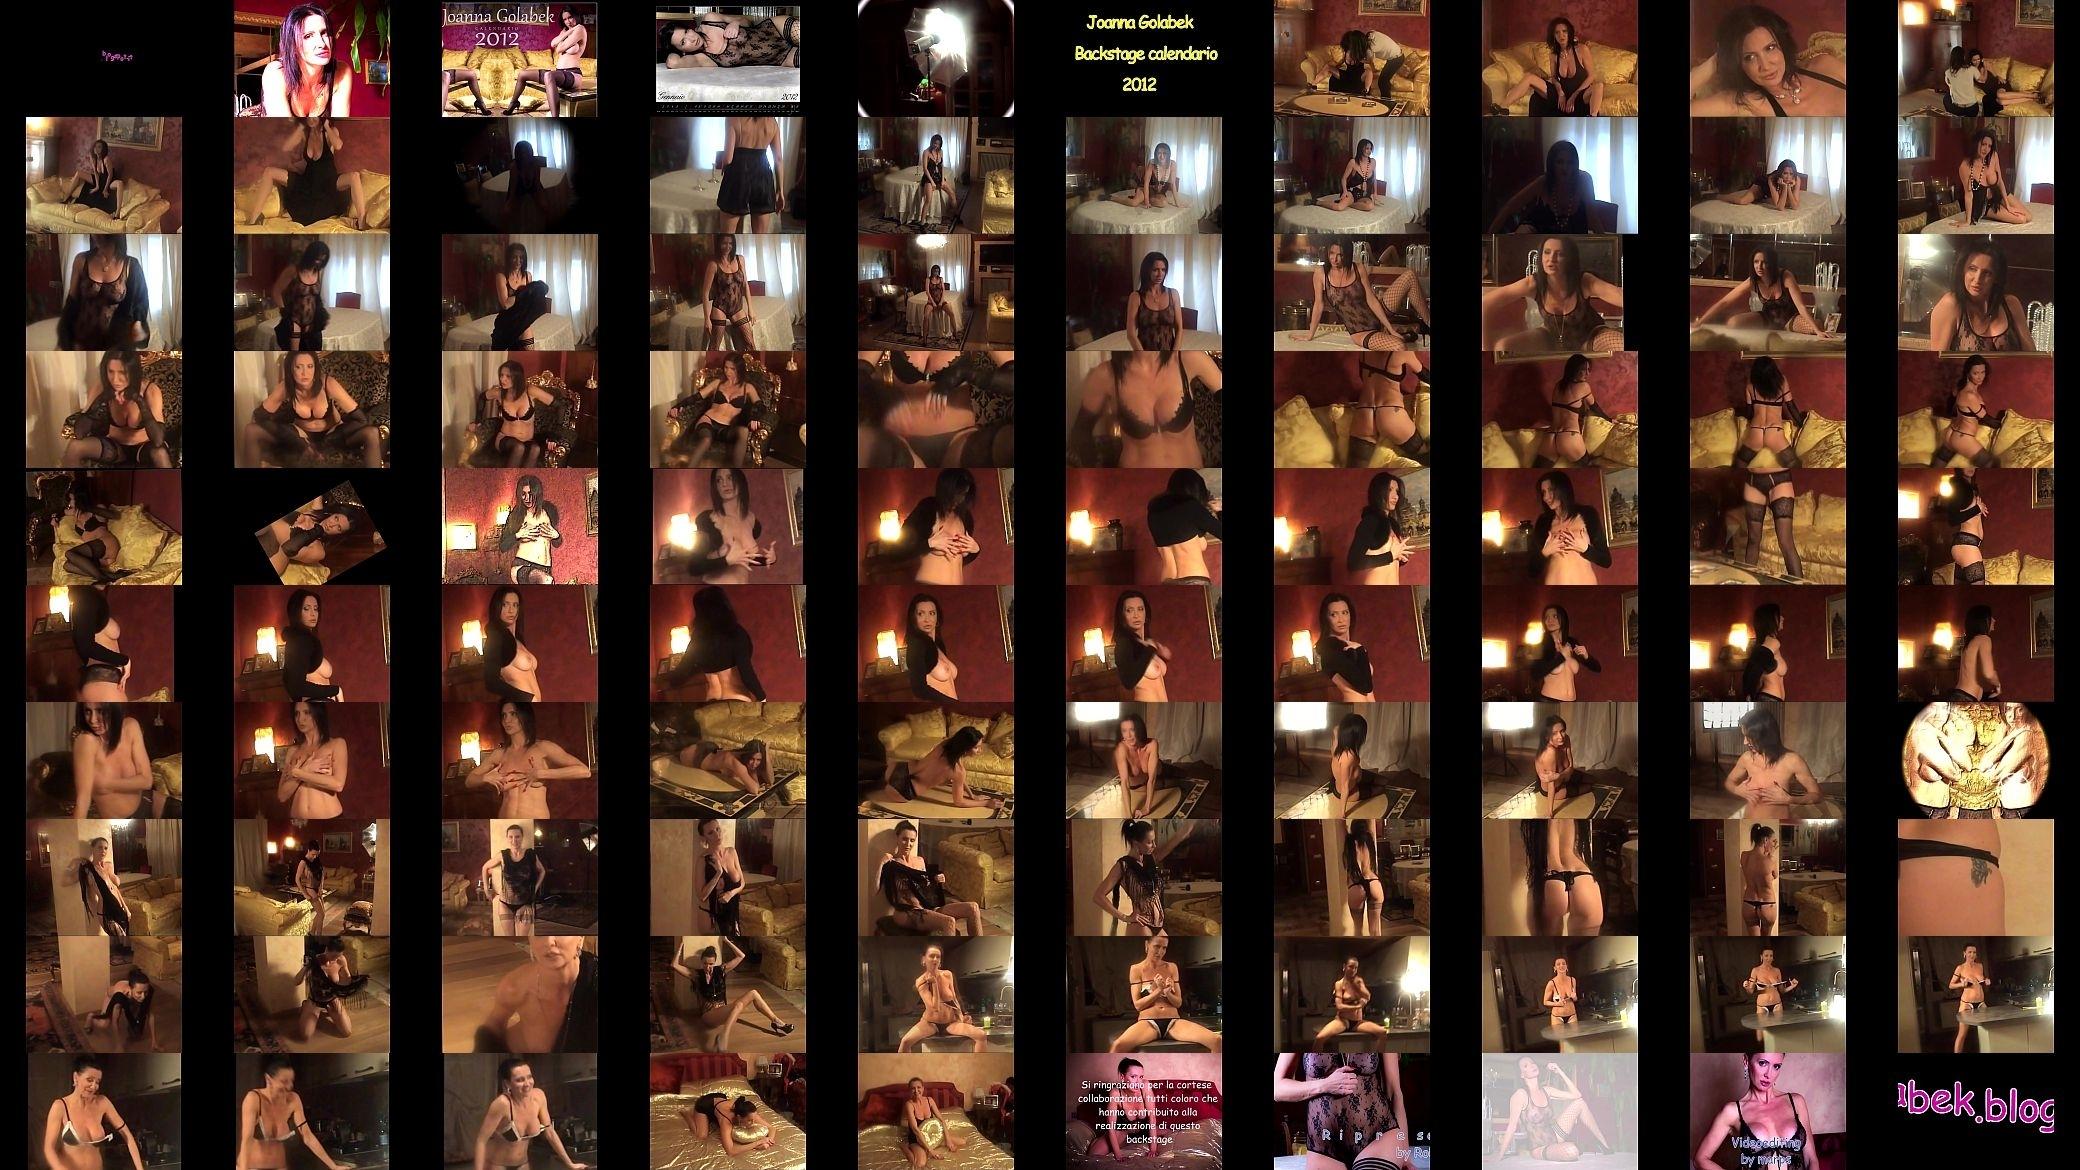 Joanna Golabek Backstage Calendario 2012 Marps - Xnxx